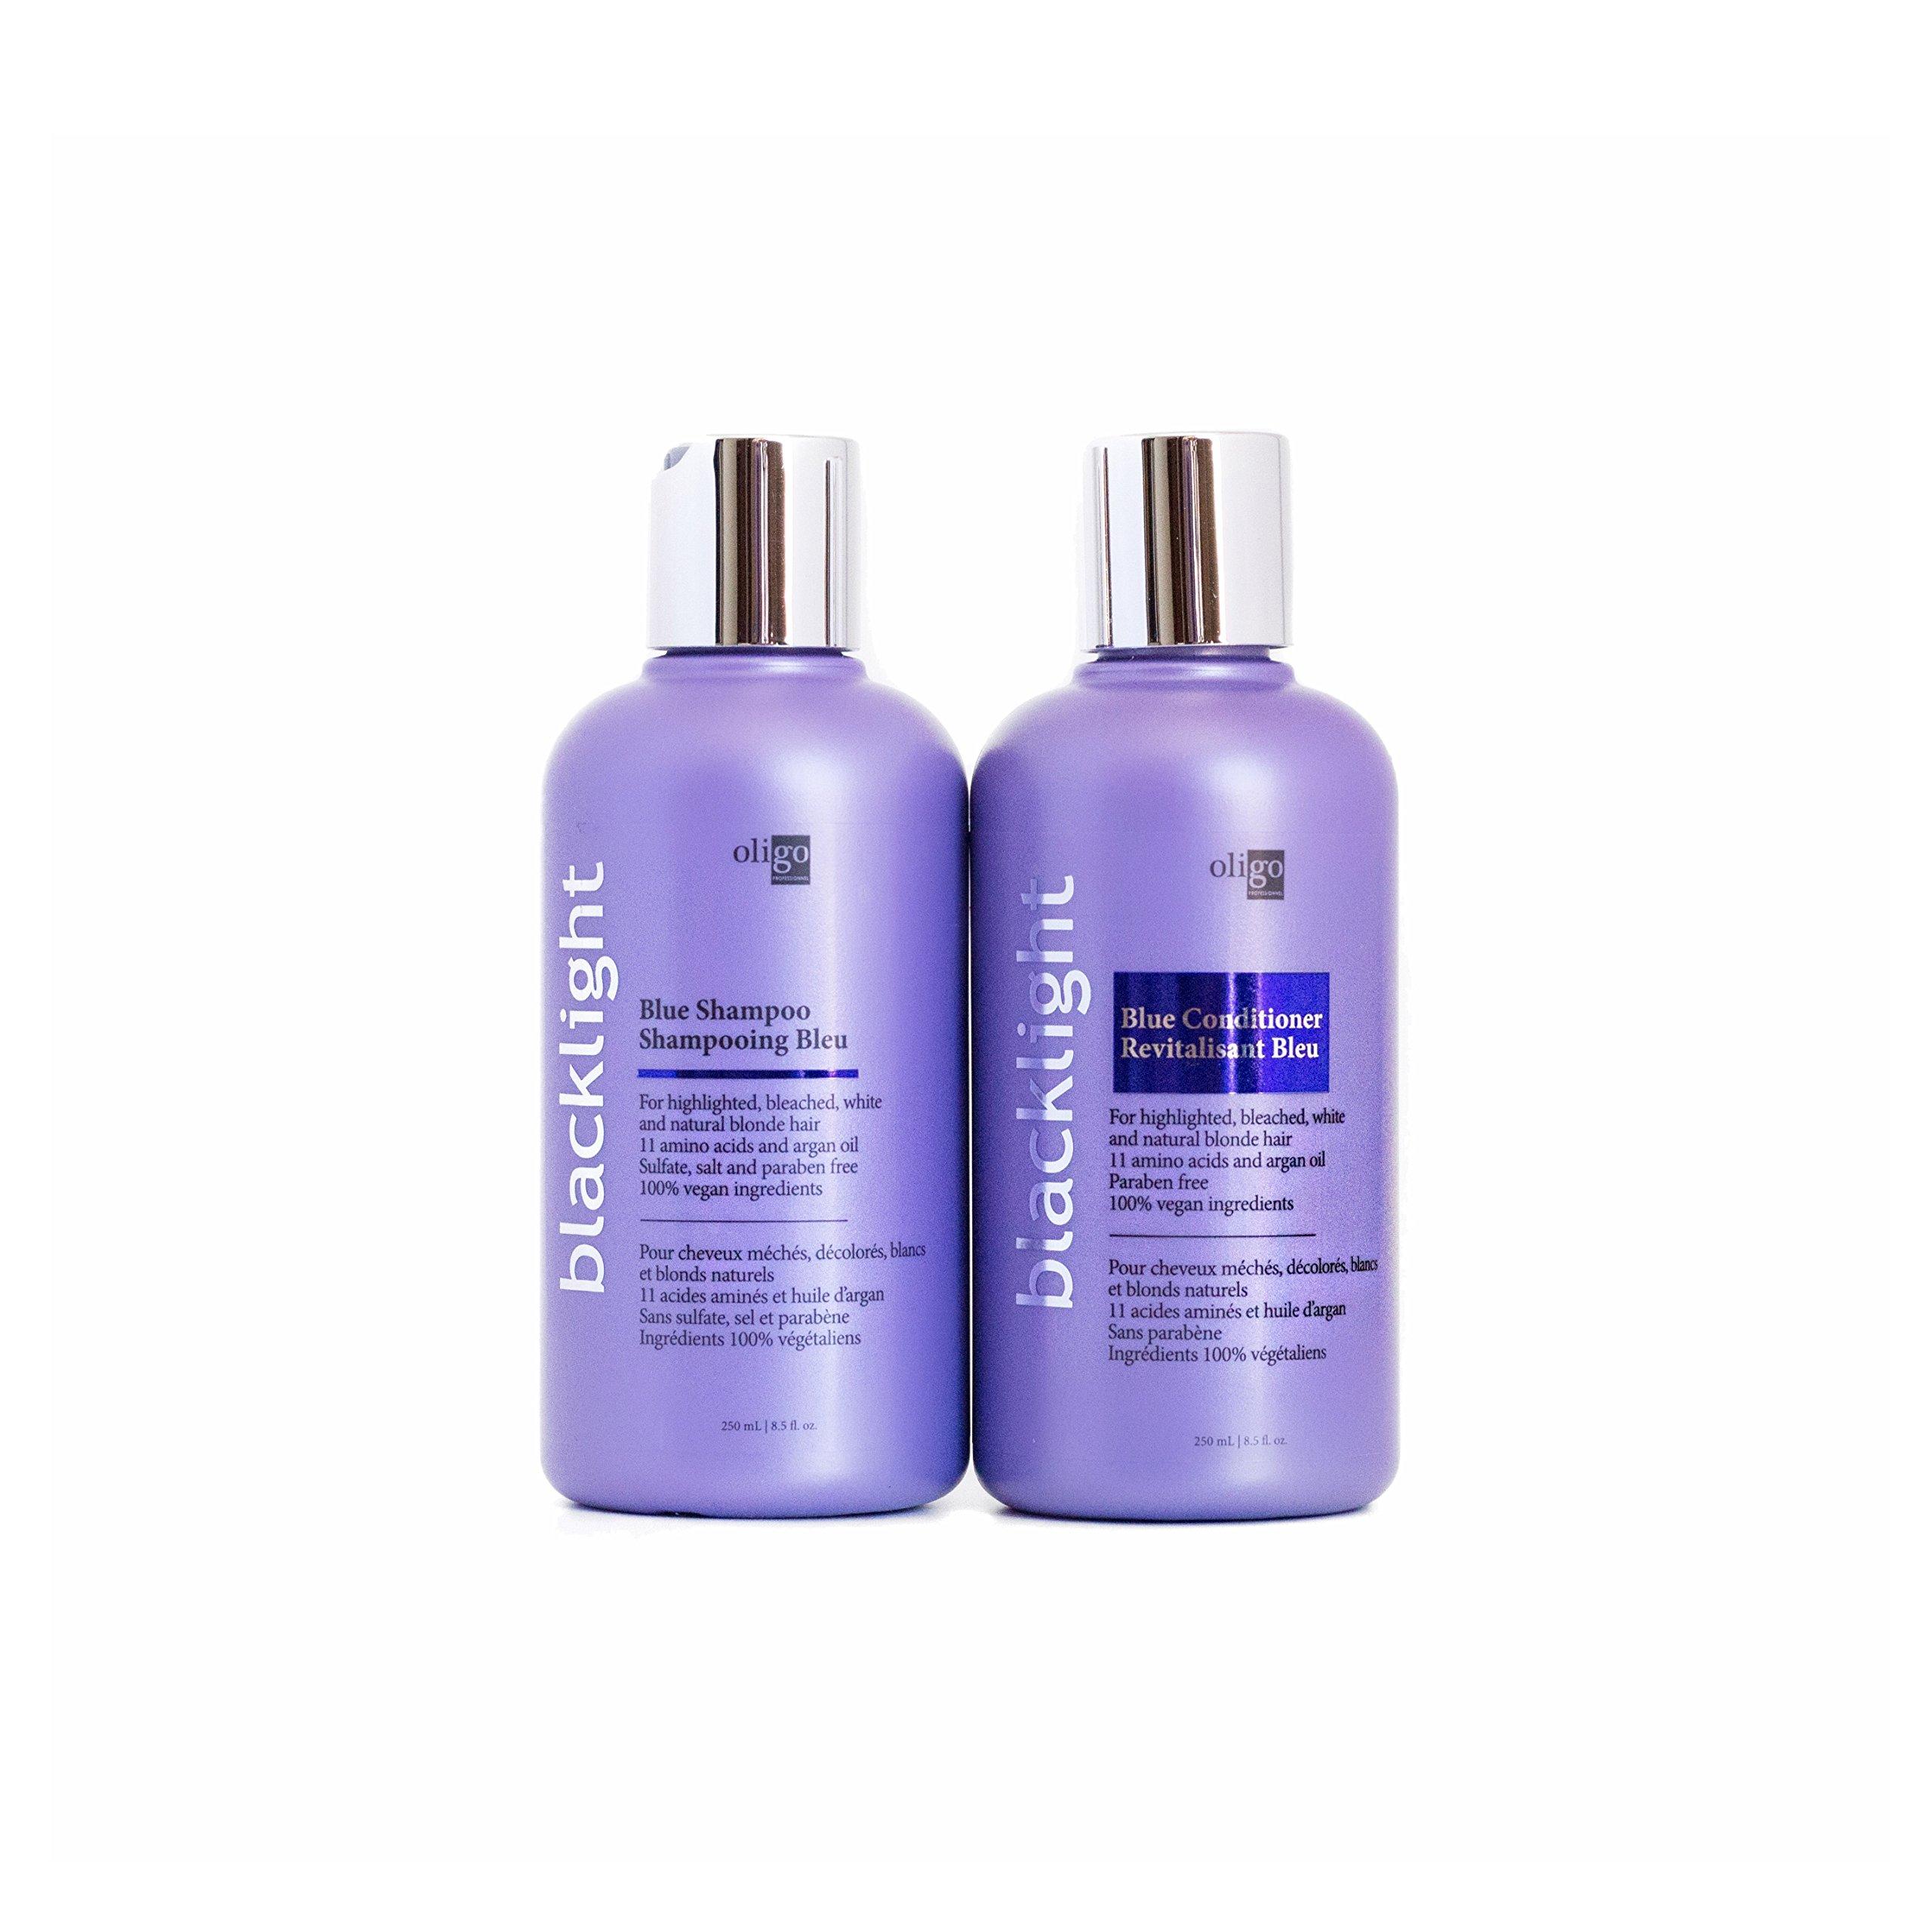 Oligo Professionnel Blacklight Blue Shampoo & Conditioner 8.5oz Duo Bundle by Oligo Professionnel